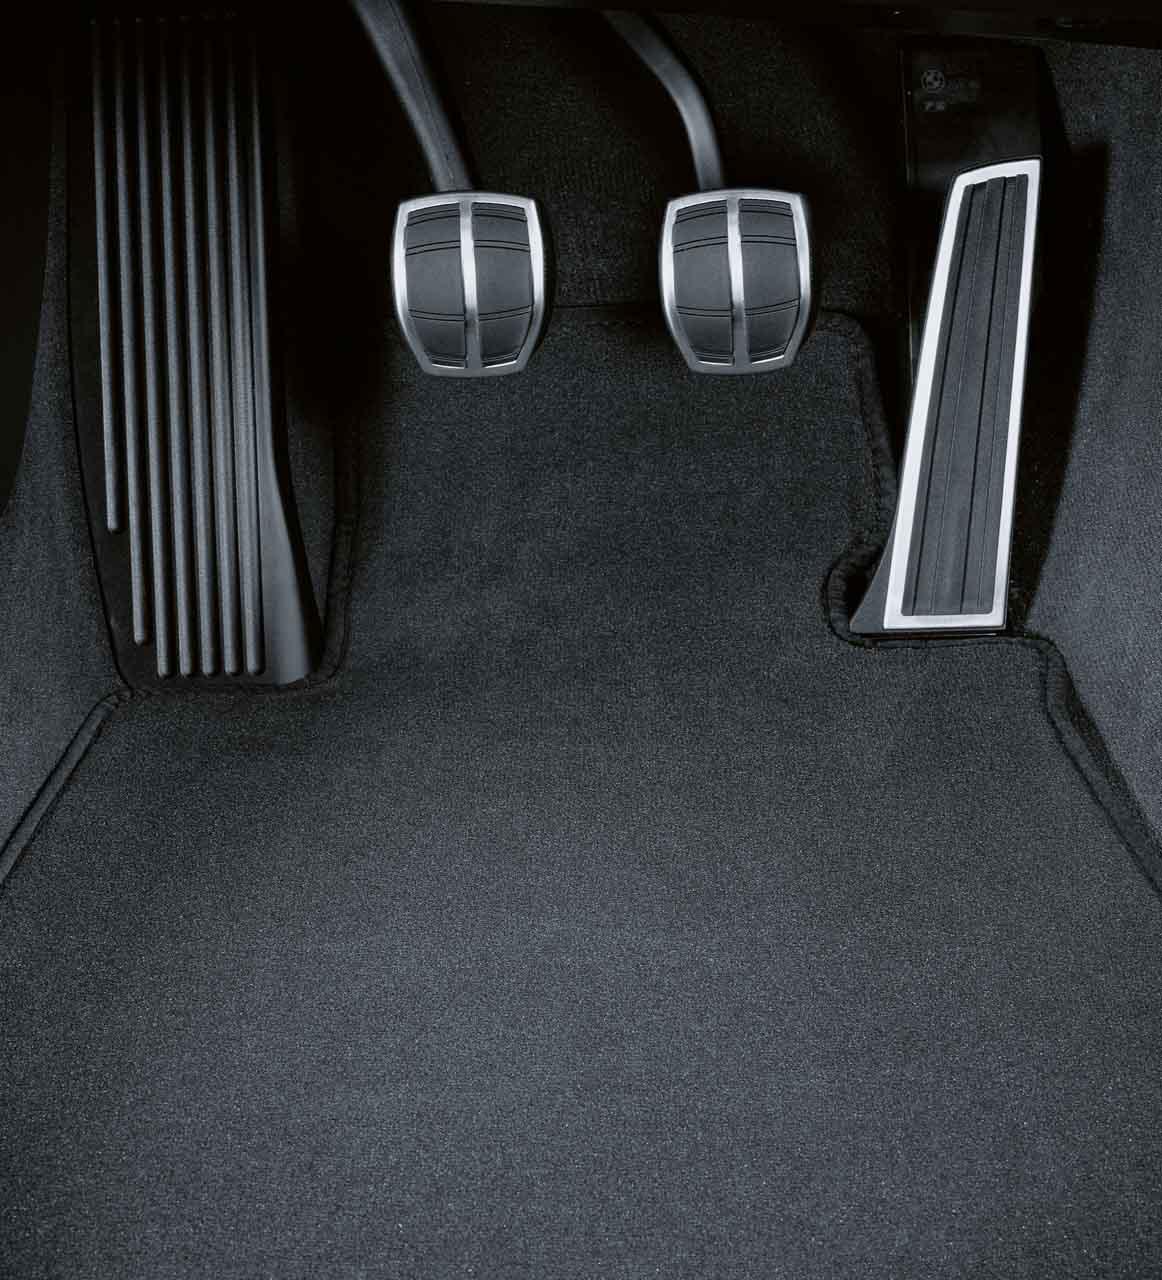 Bmw rubber floor mats e90 - Bmw Genuine Tailored Velour Car Floor Mats Set E90 E91 3 Series 51477316578